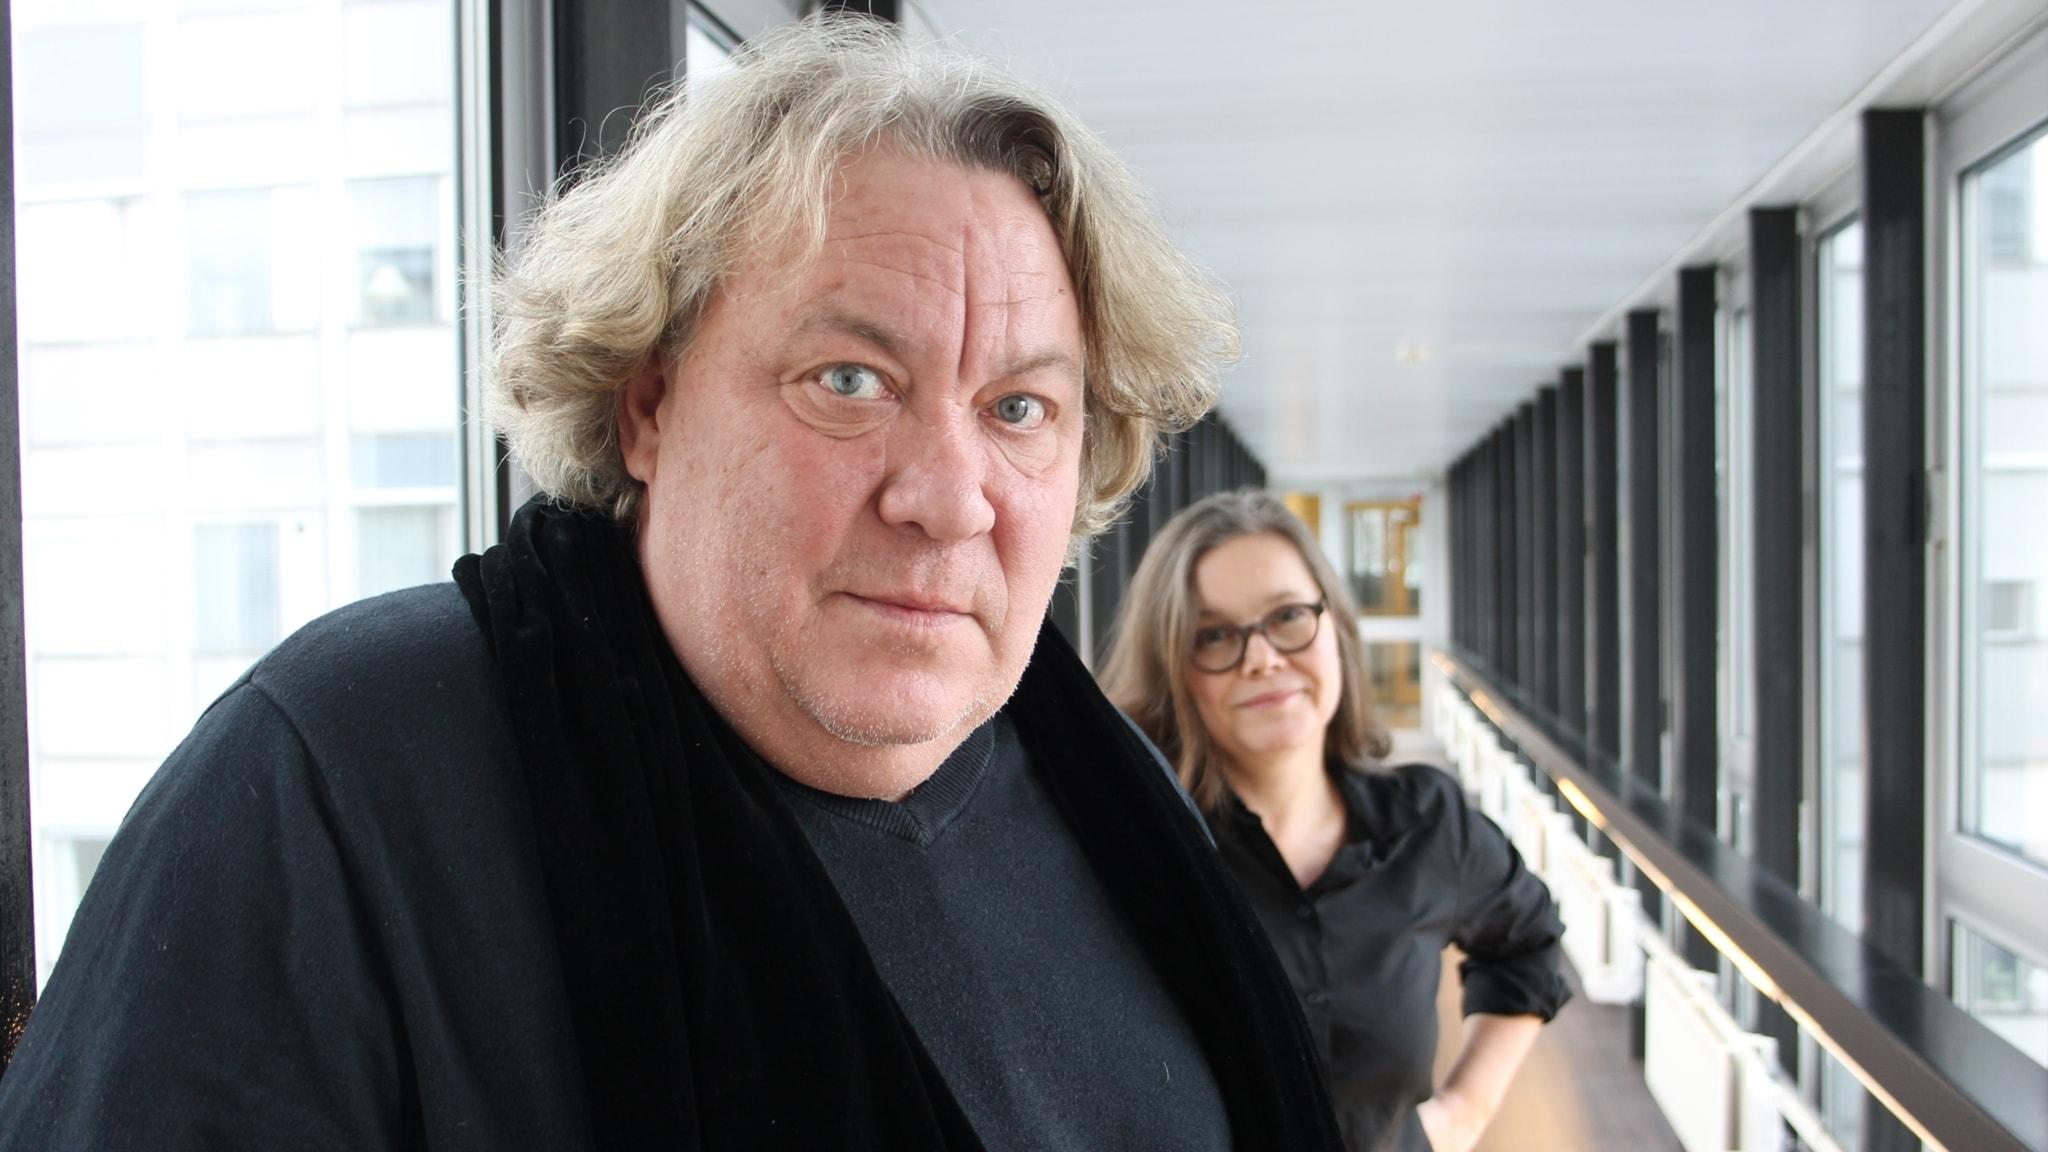 Möt skådespelaren Leif Andrée